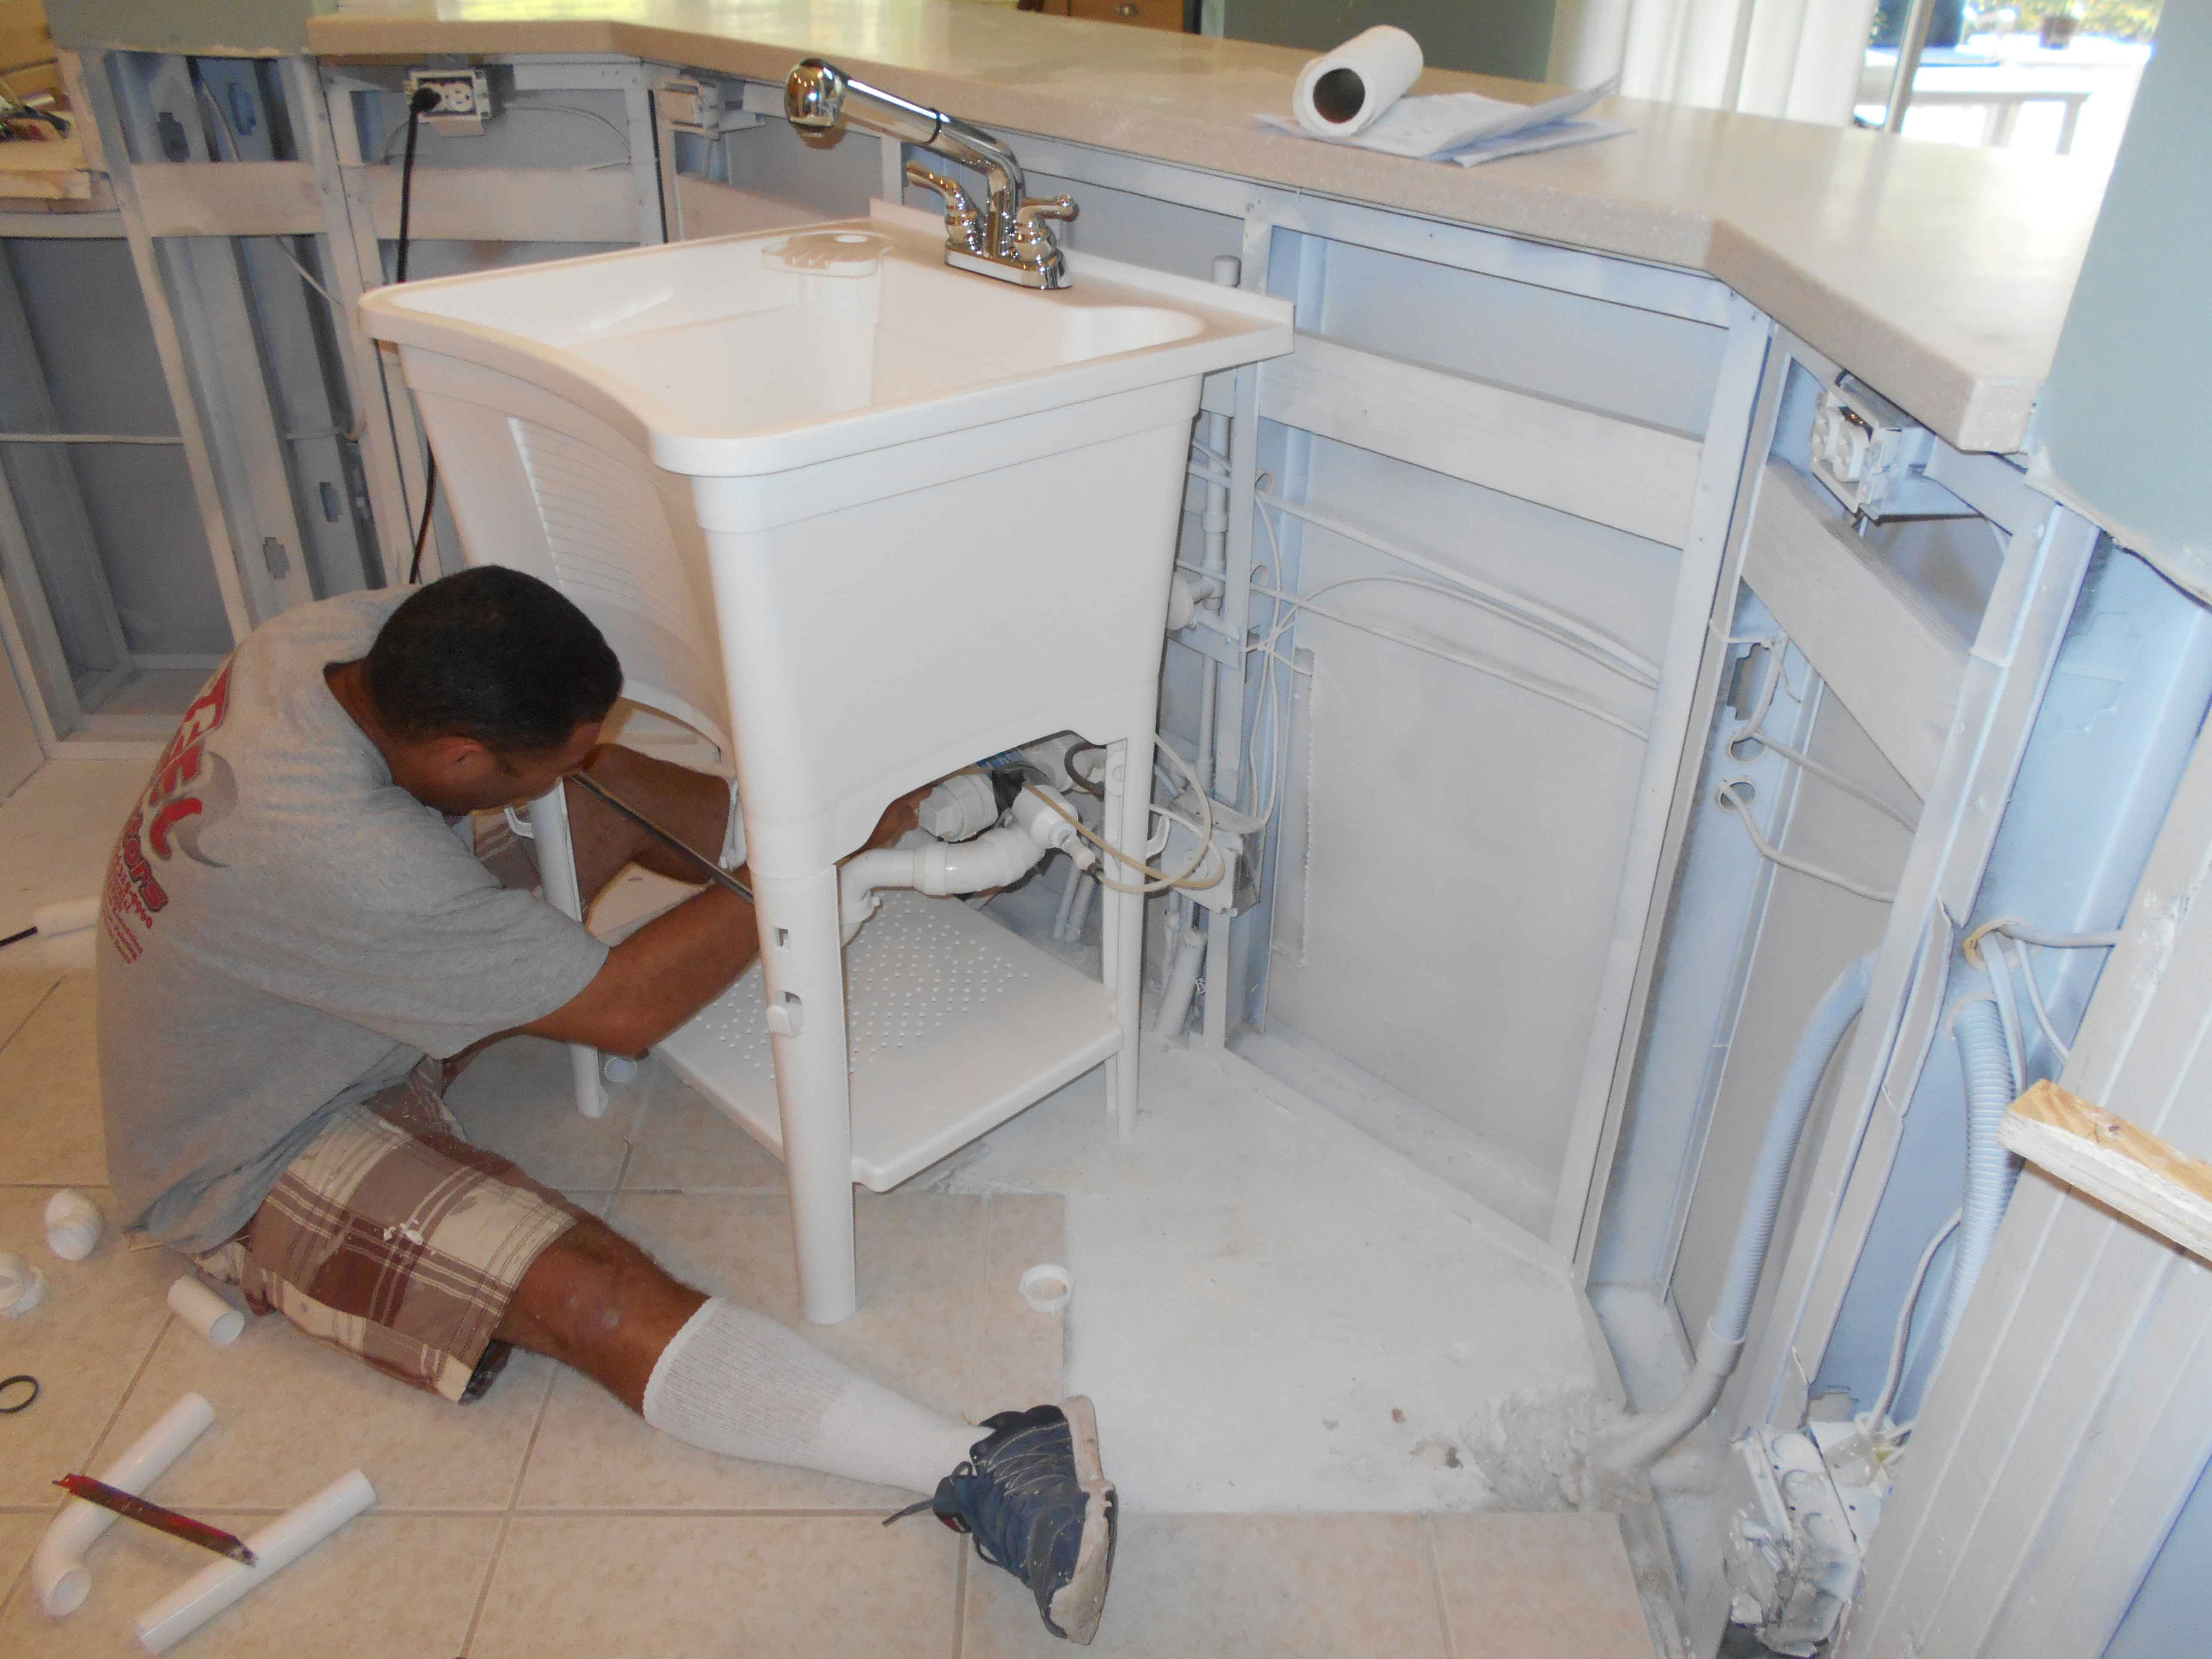 Reel-Contractors-Kitchen-Sink-Instalation-Experts-Reconstruction-Pembroke-Pines-Fl-Comapny